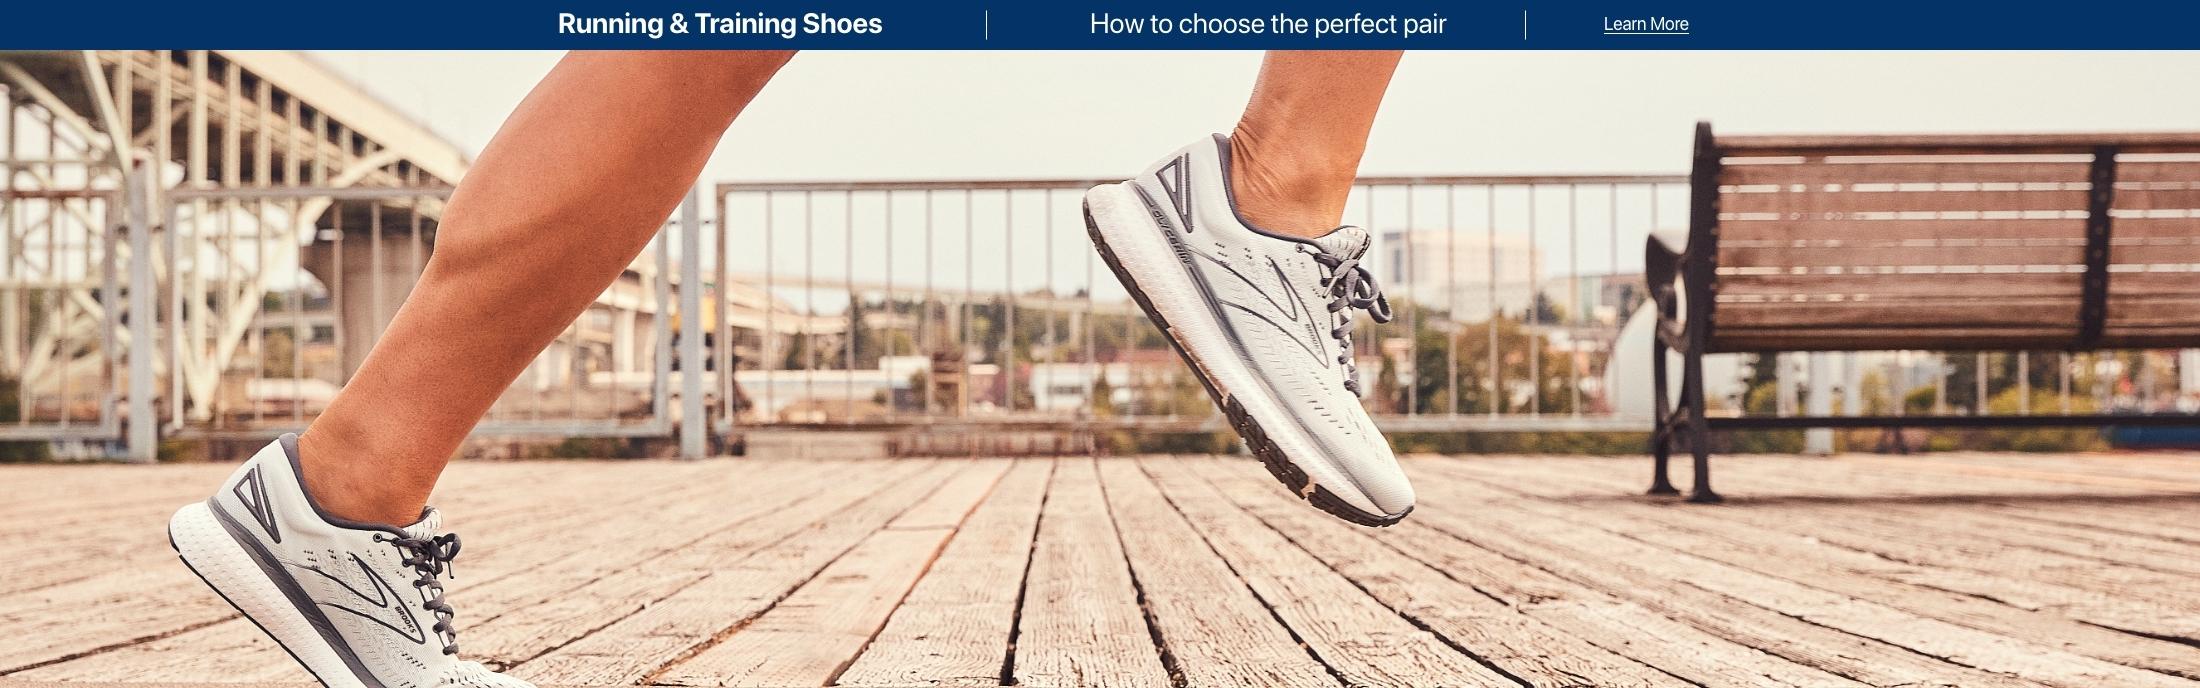 Running & Training Shoes